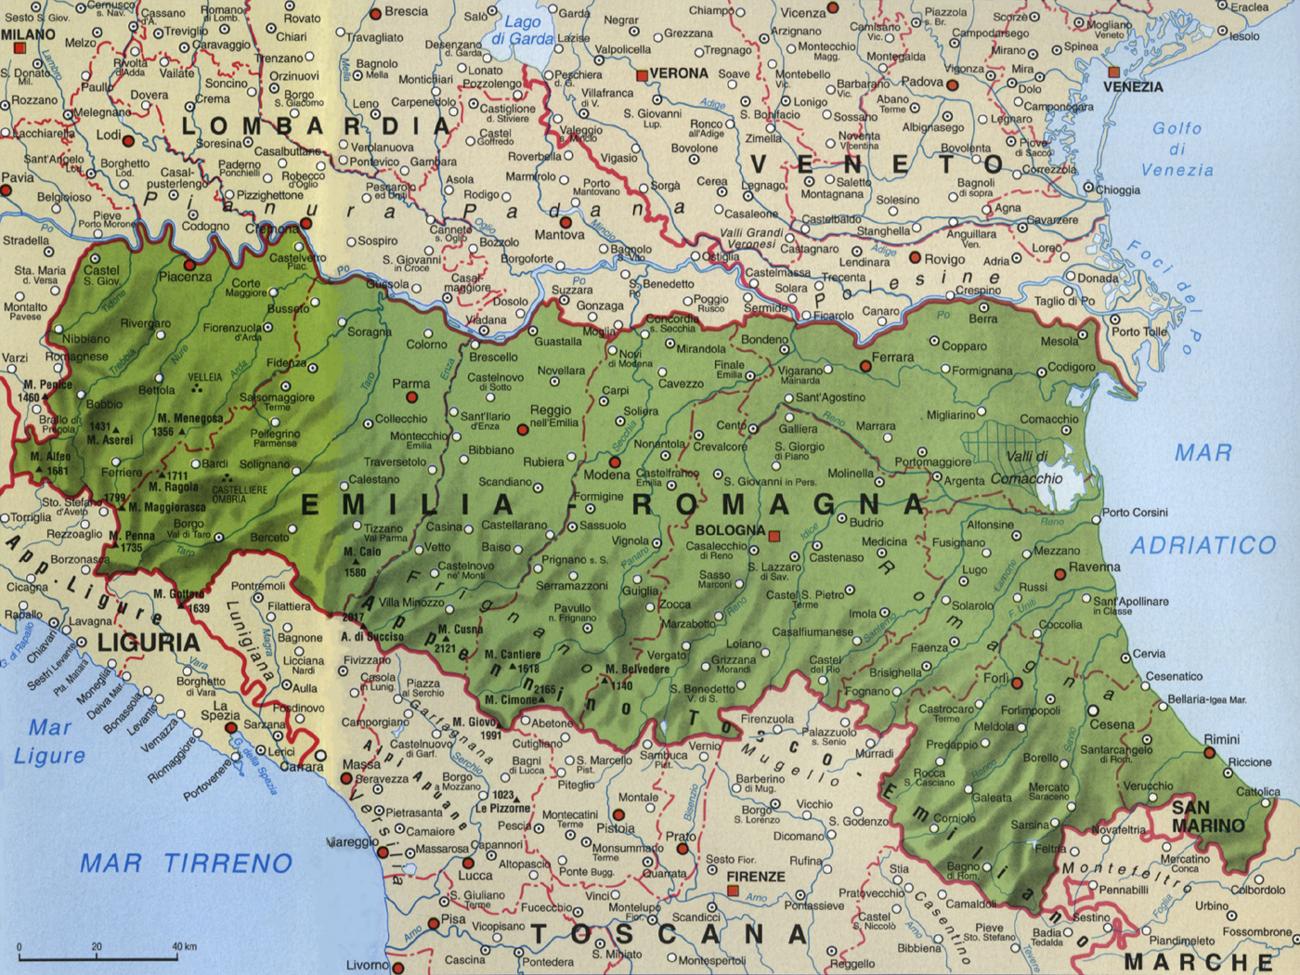 Cartina dell'Emilia Romagna